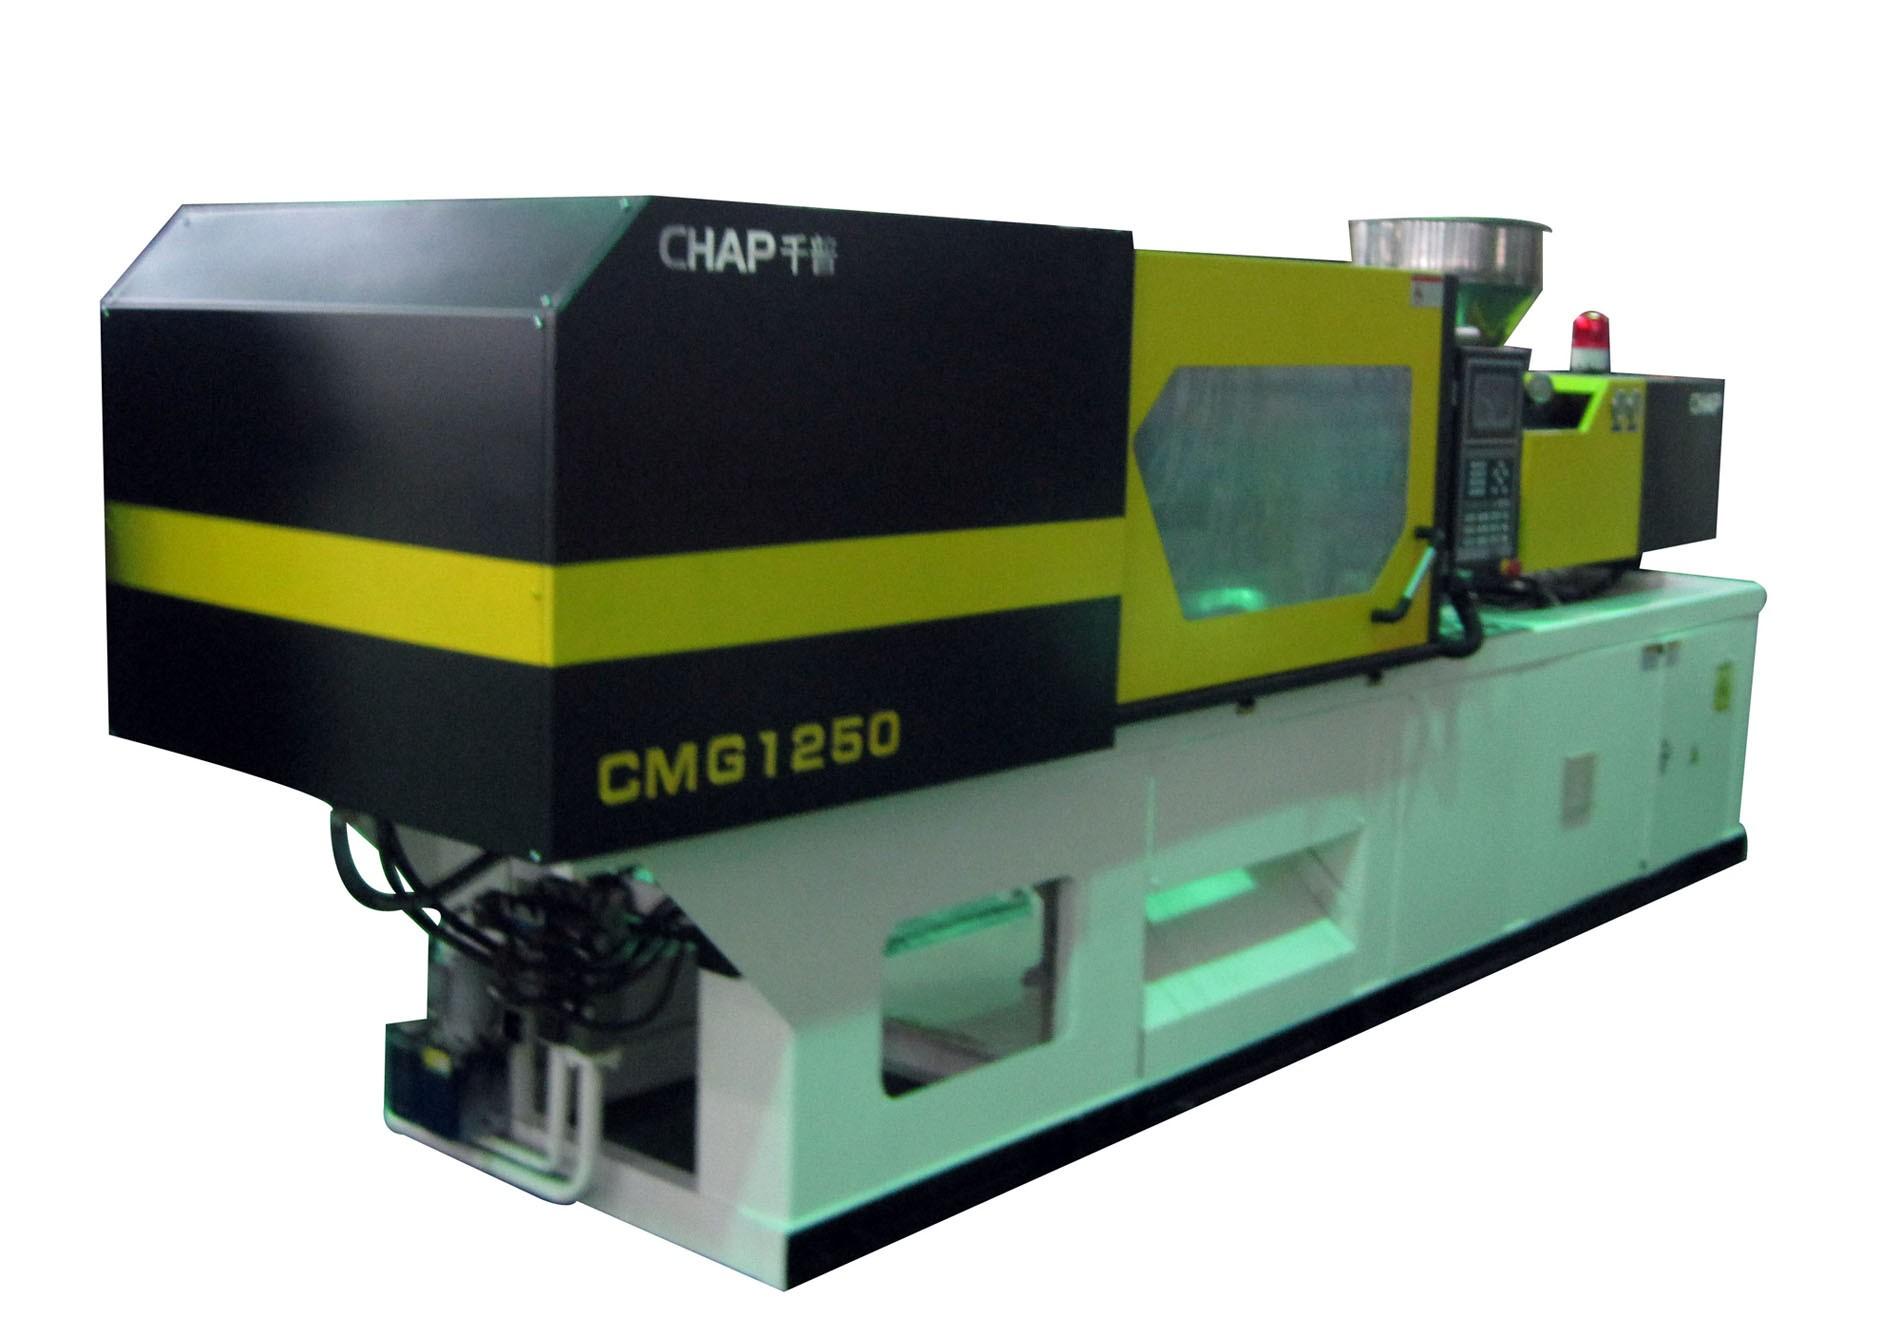 CMG 1250